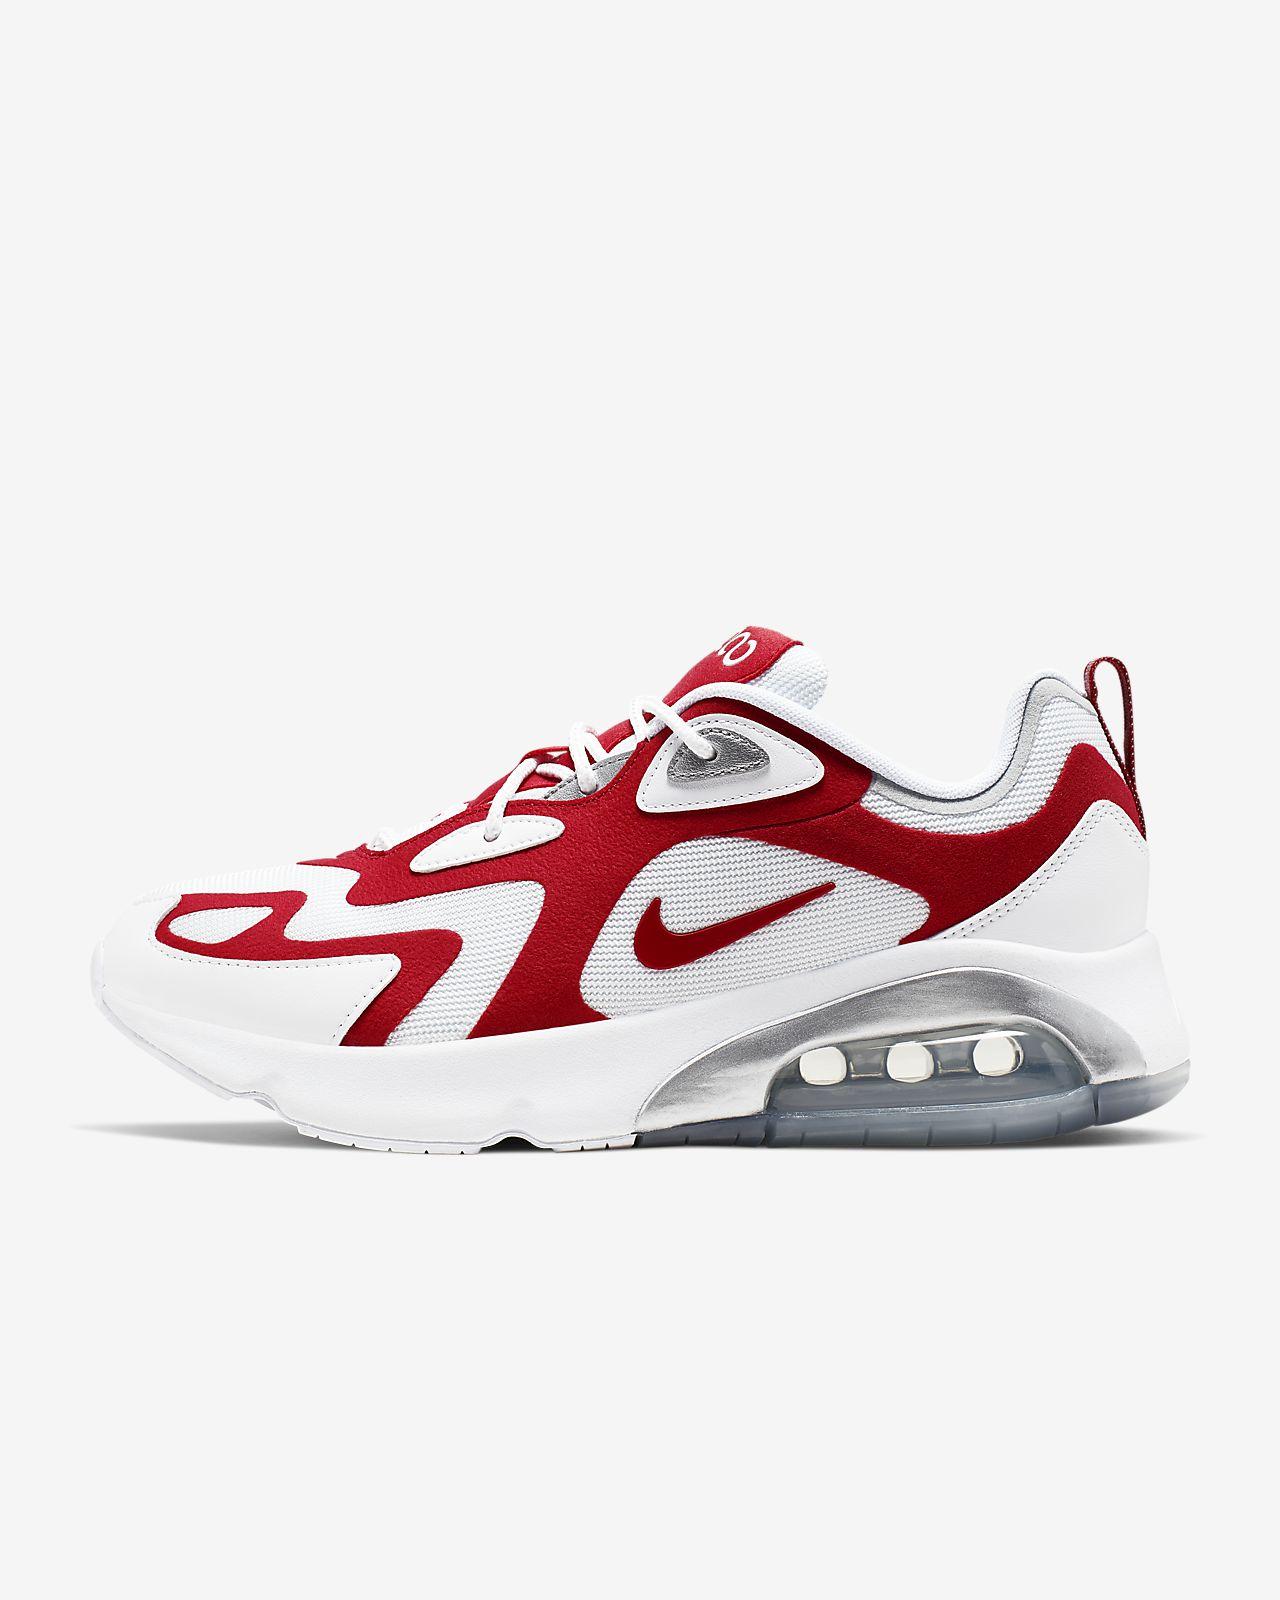 nike air max uomo running scarpe red nero